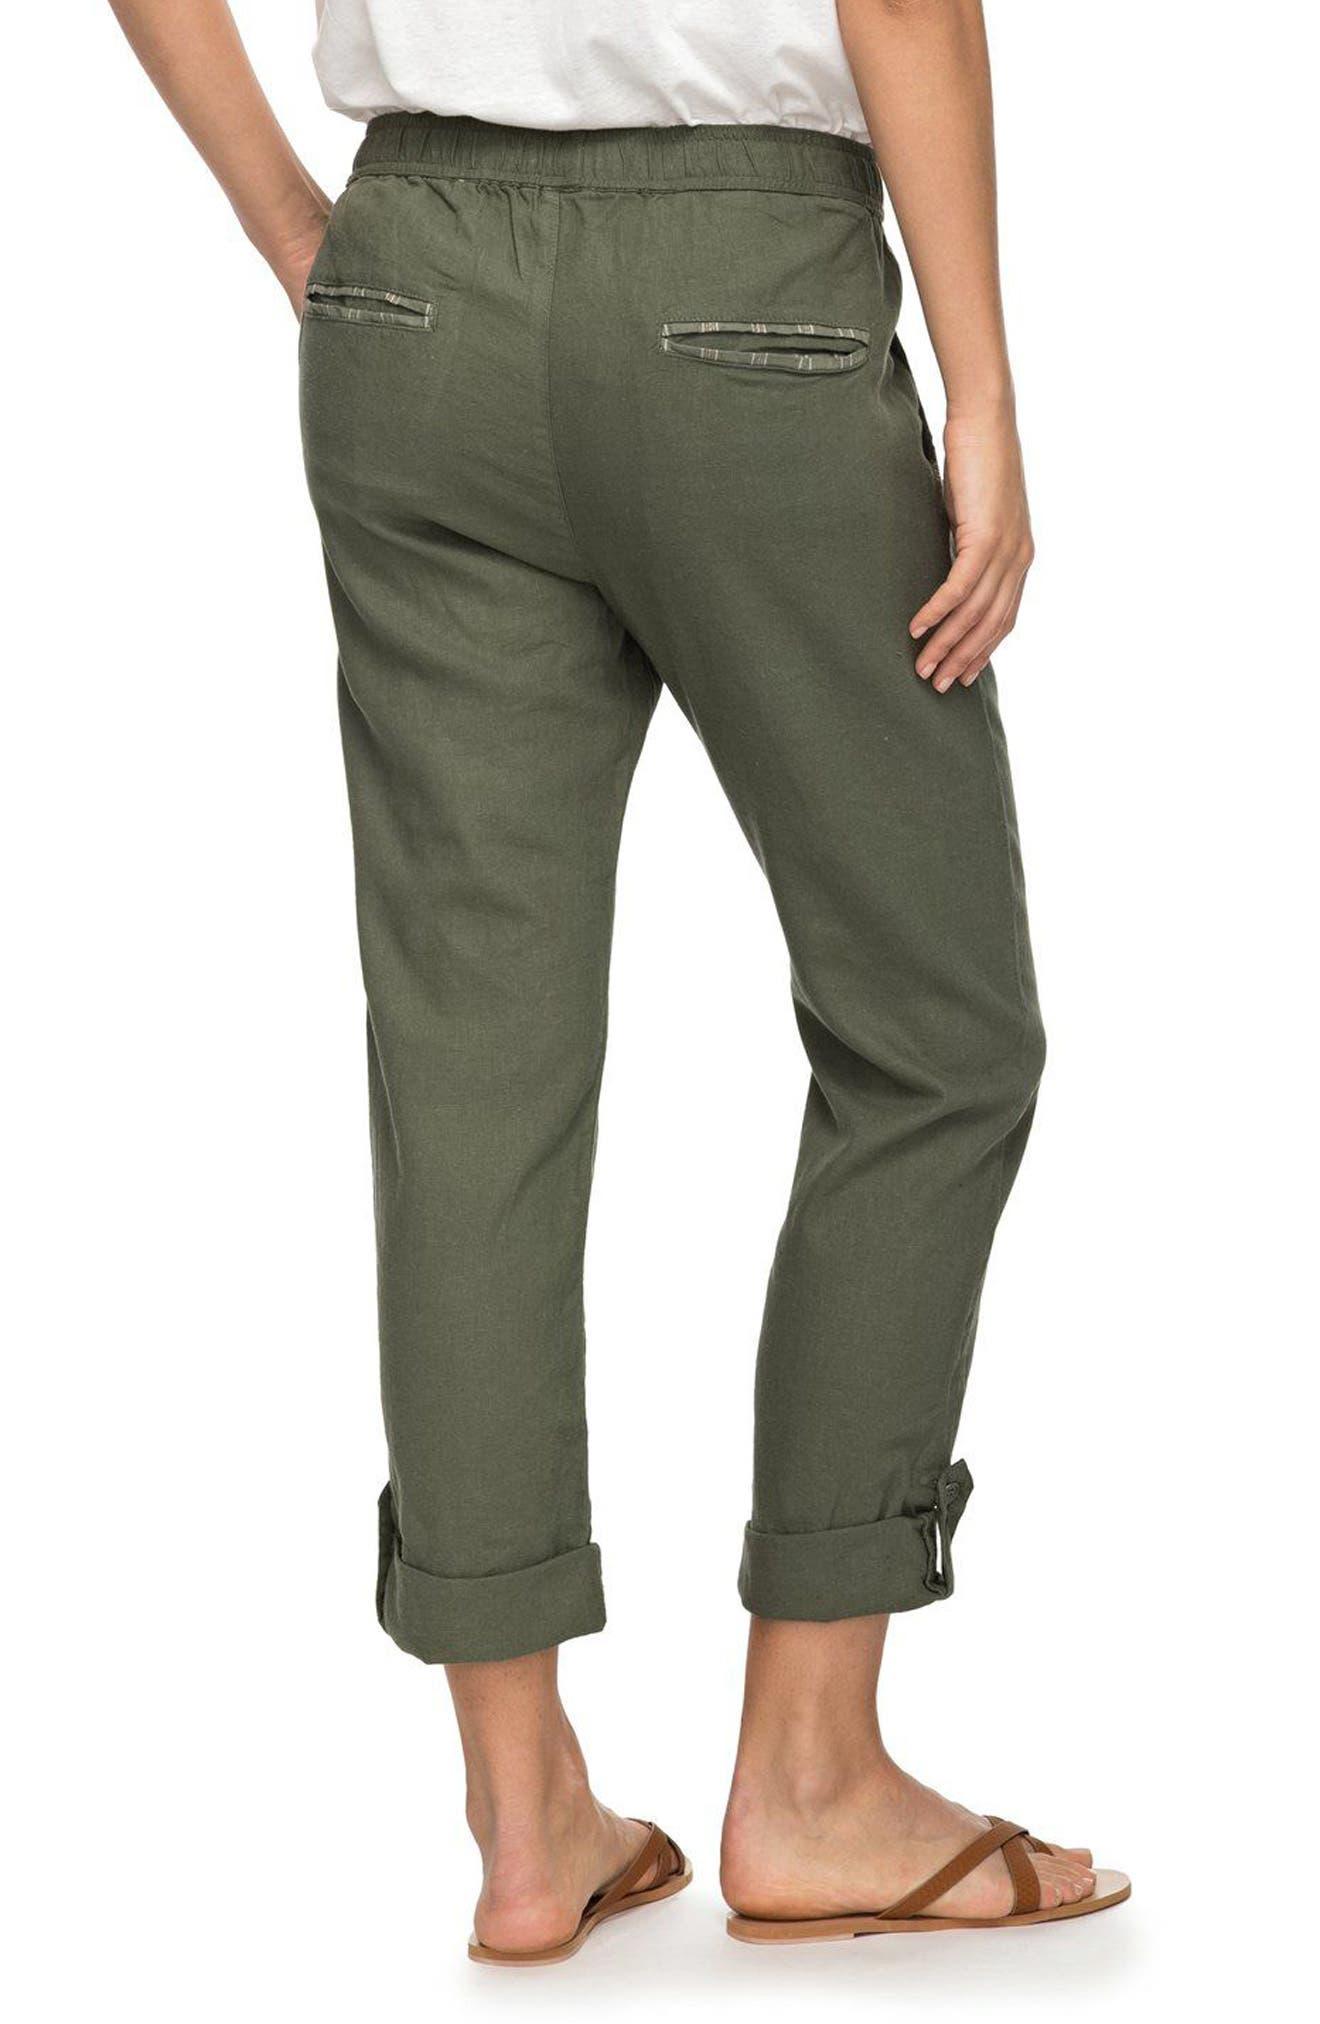 Symphony Lover Linen Blend Pants,                             Alternate thumbnail 3, color,                             Dusty Olive